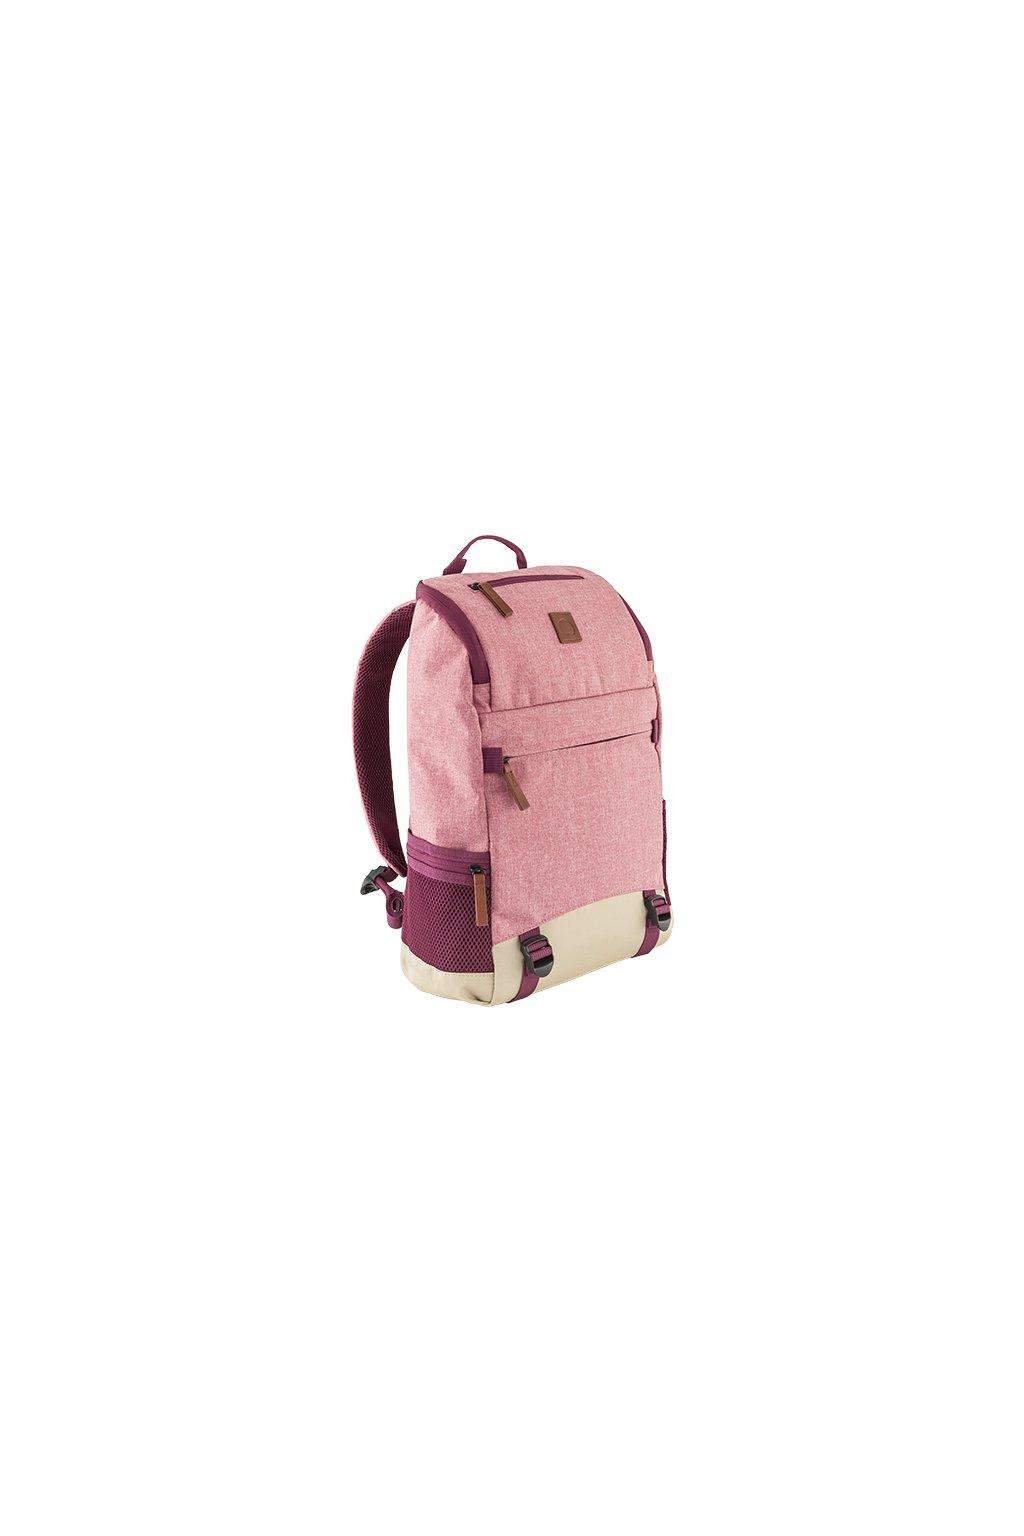 kufrland delsey maubert backpack pink (1)